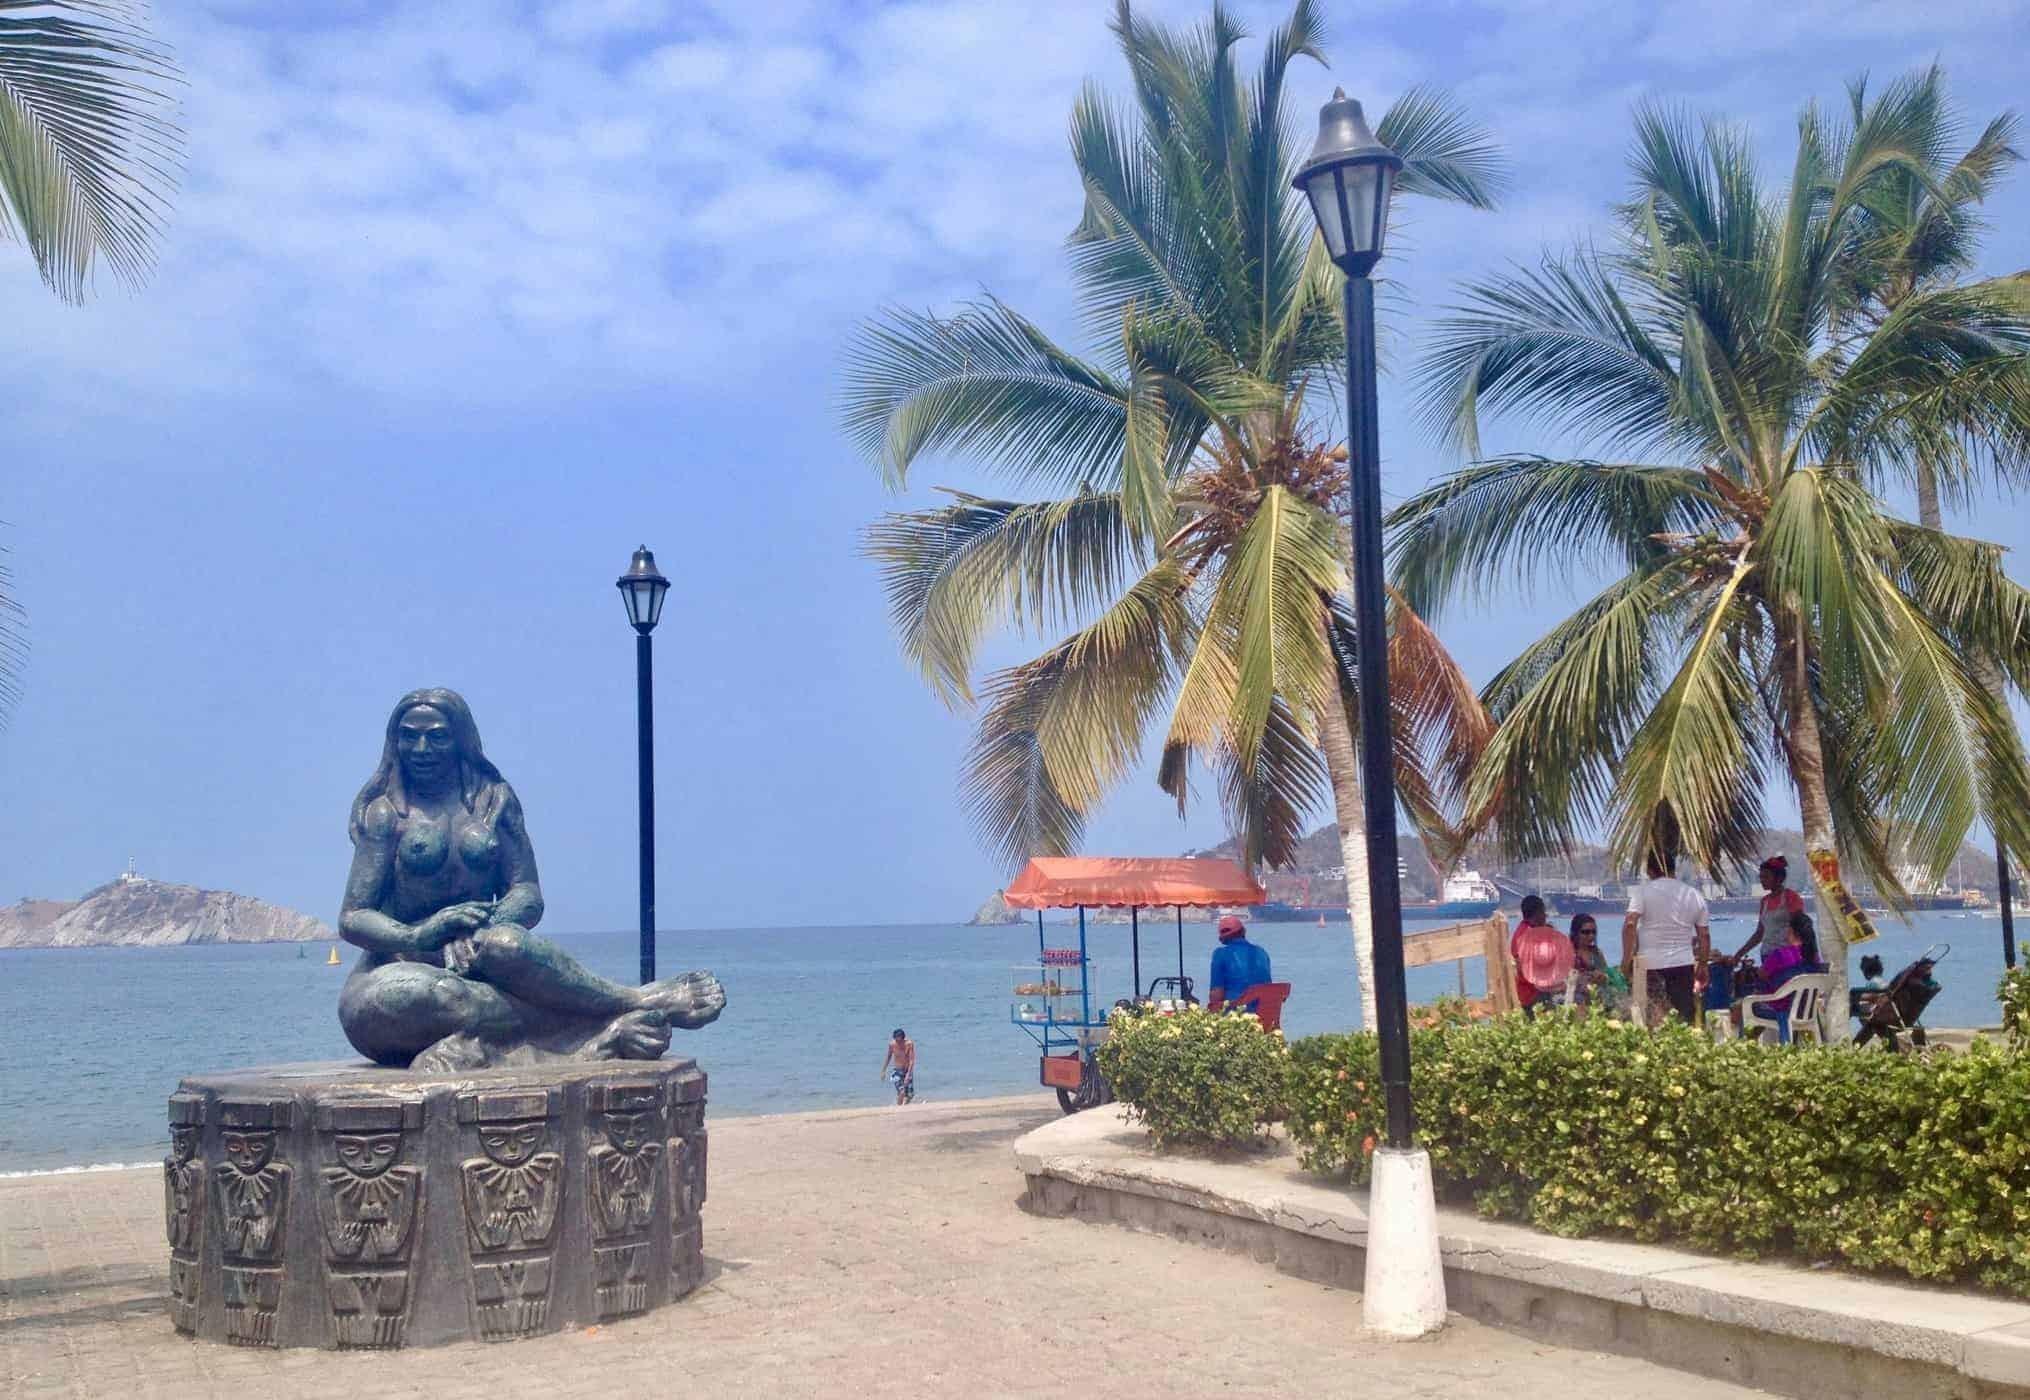 The sea front at Santa Marta, Colombia